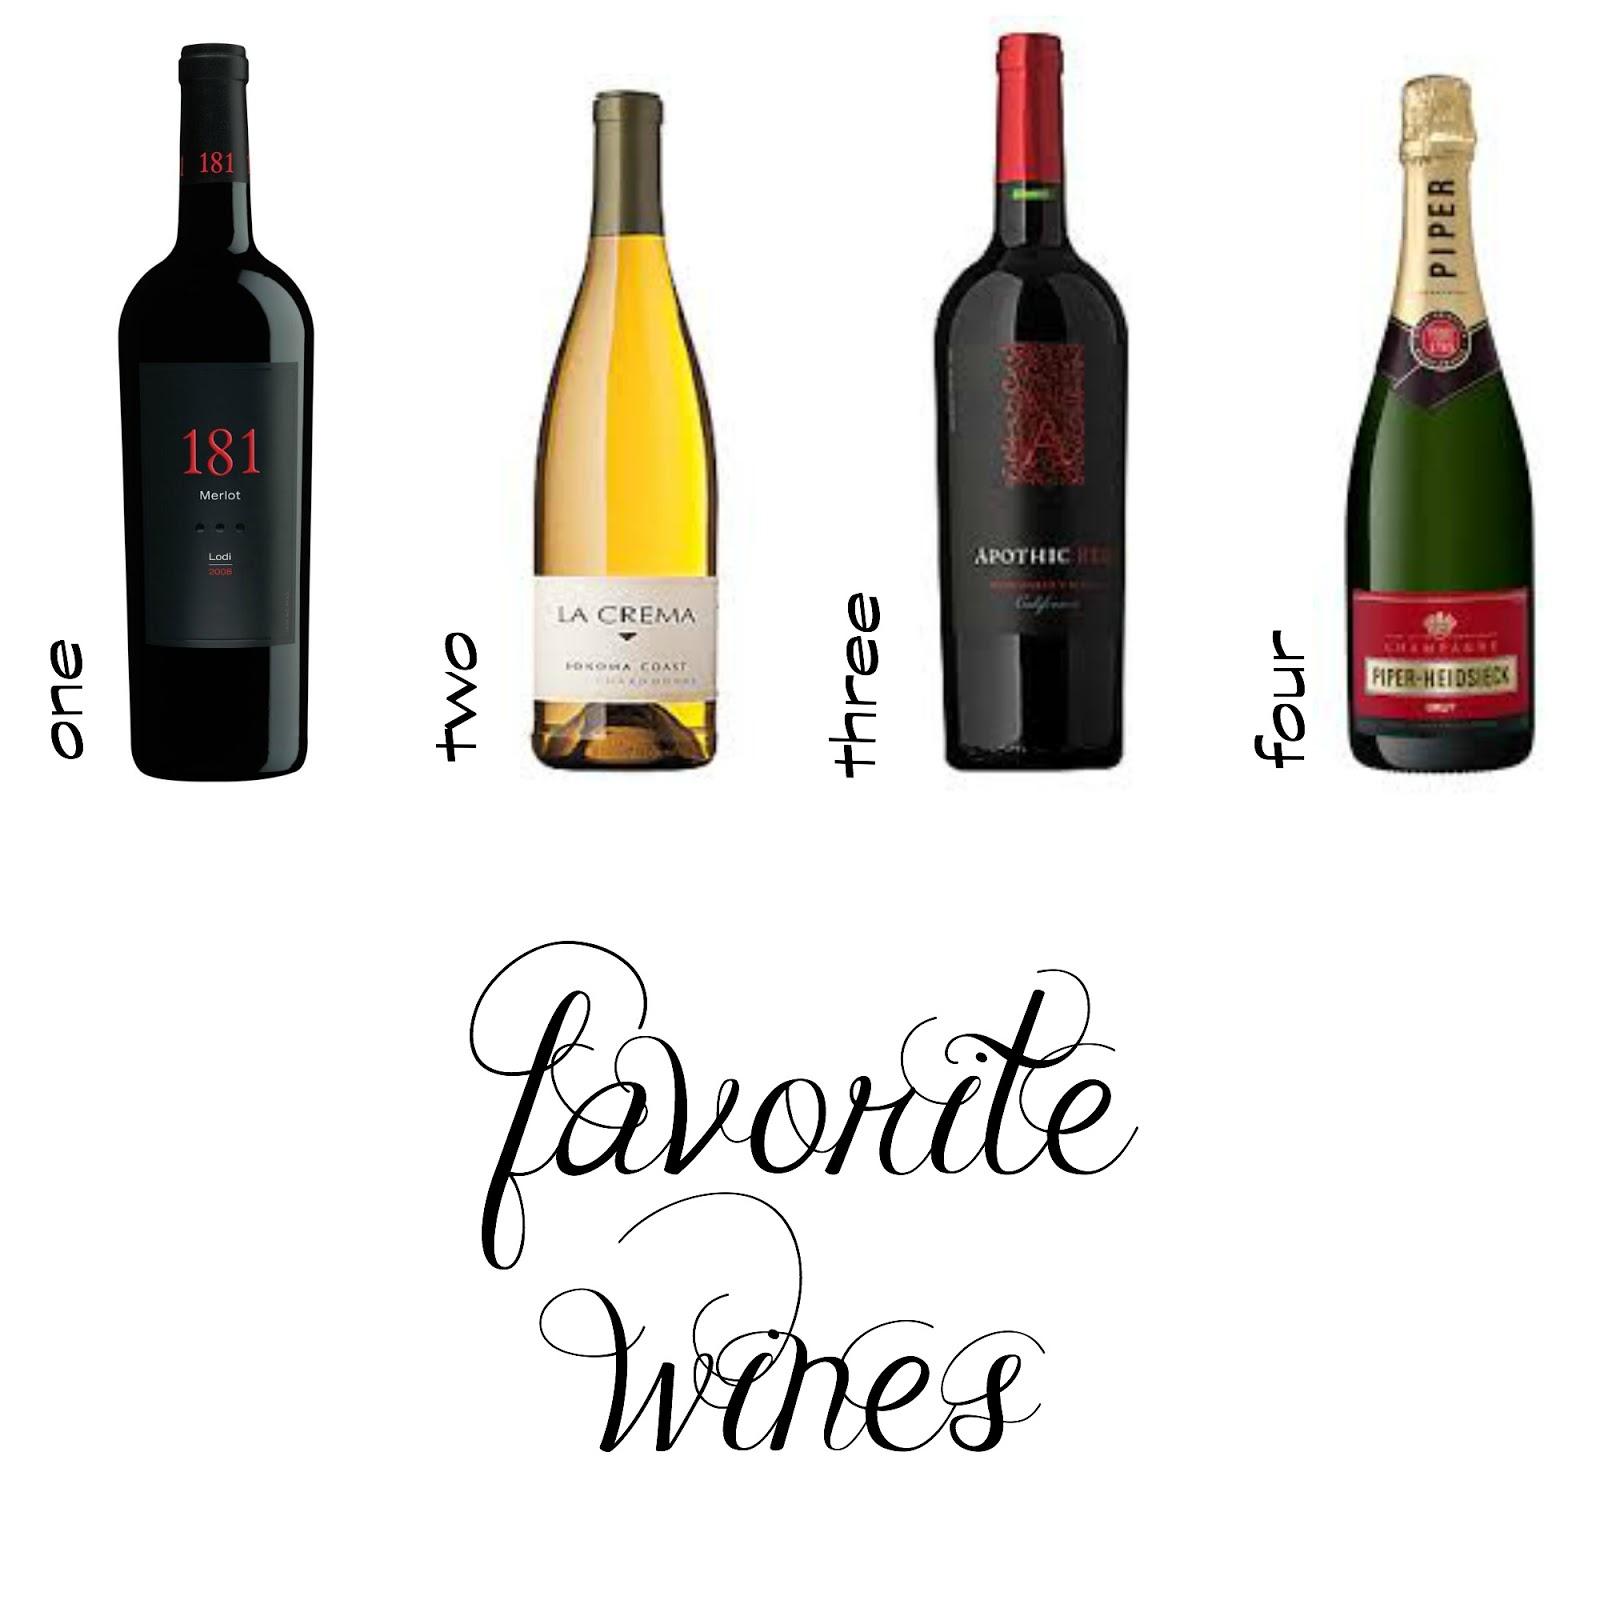 181 Merlot / La Crema Chardonnay / Apothic Red